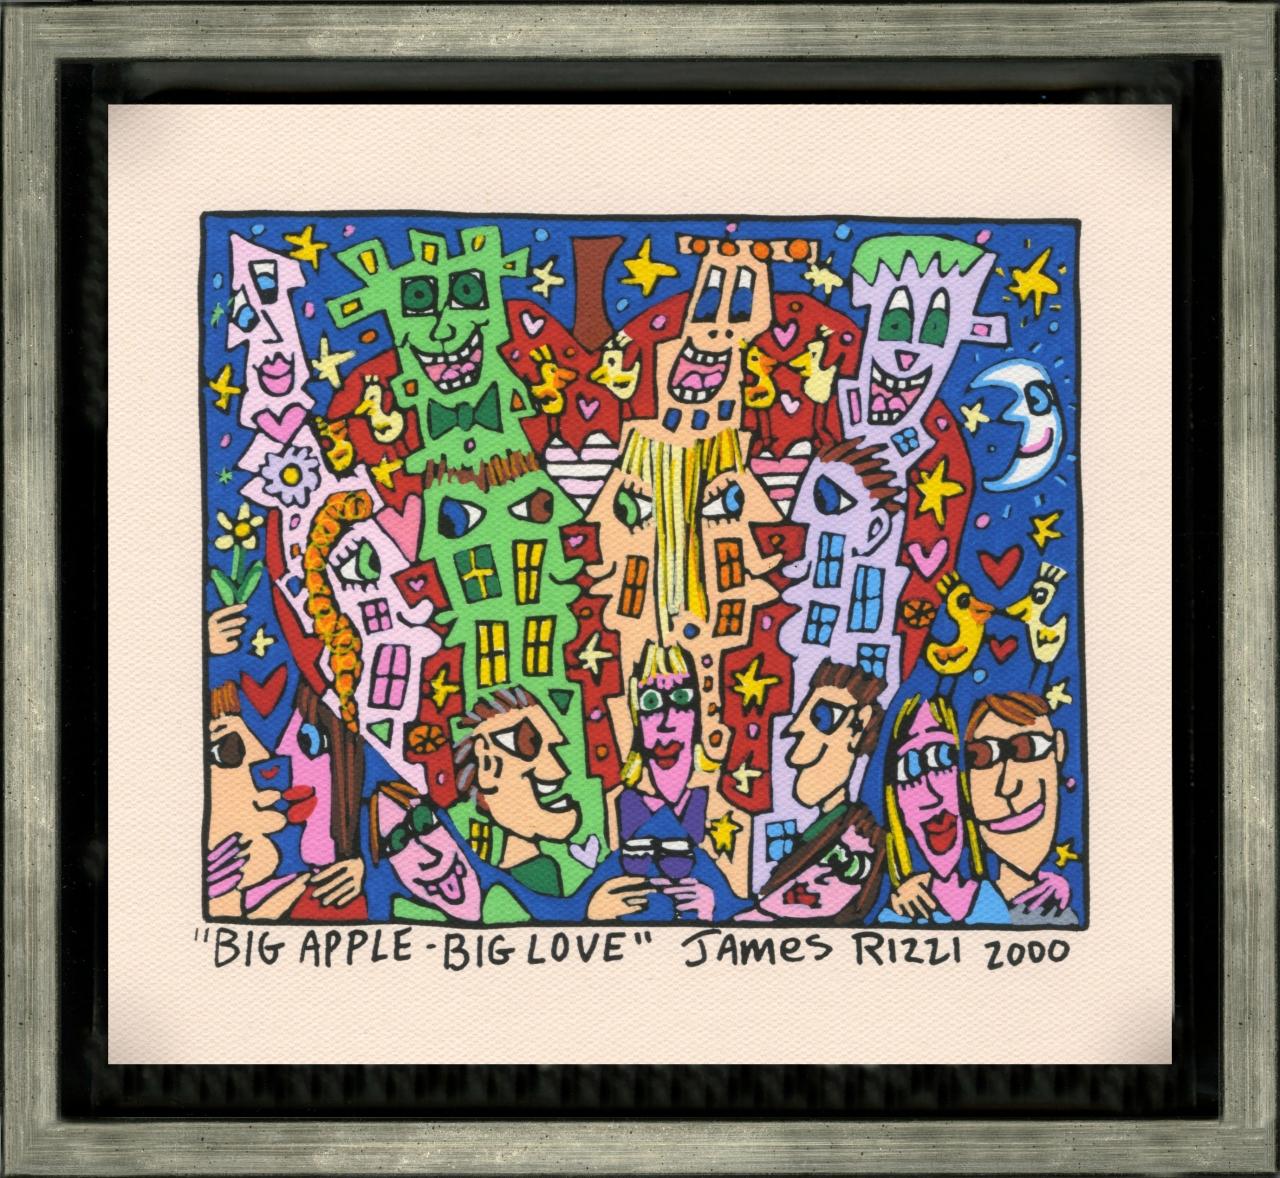 Big Apple - Big Love im Vergolderrahmen